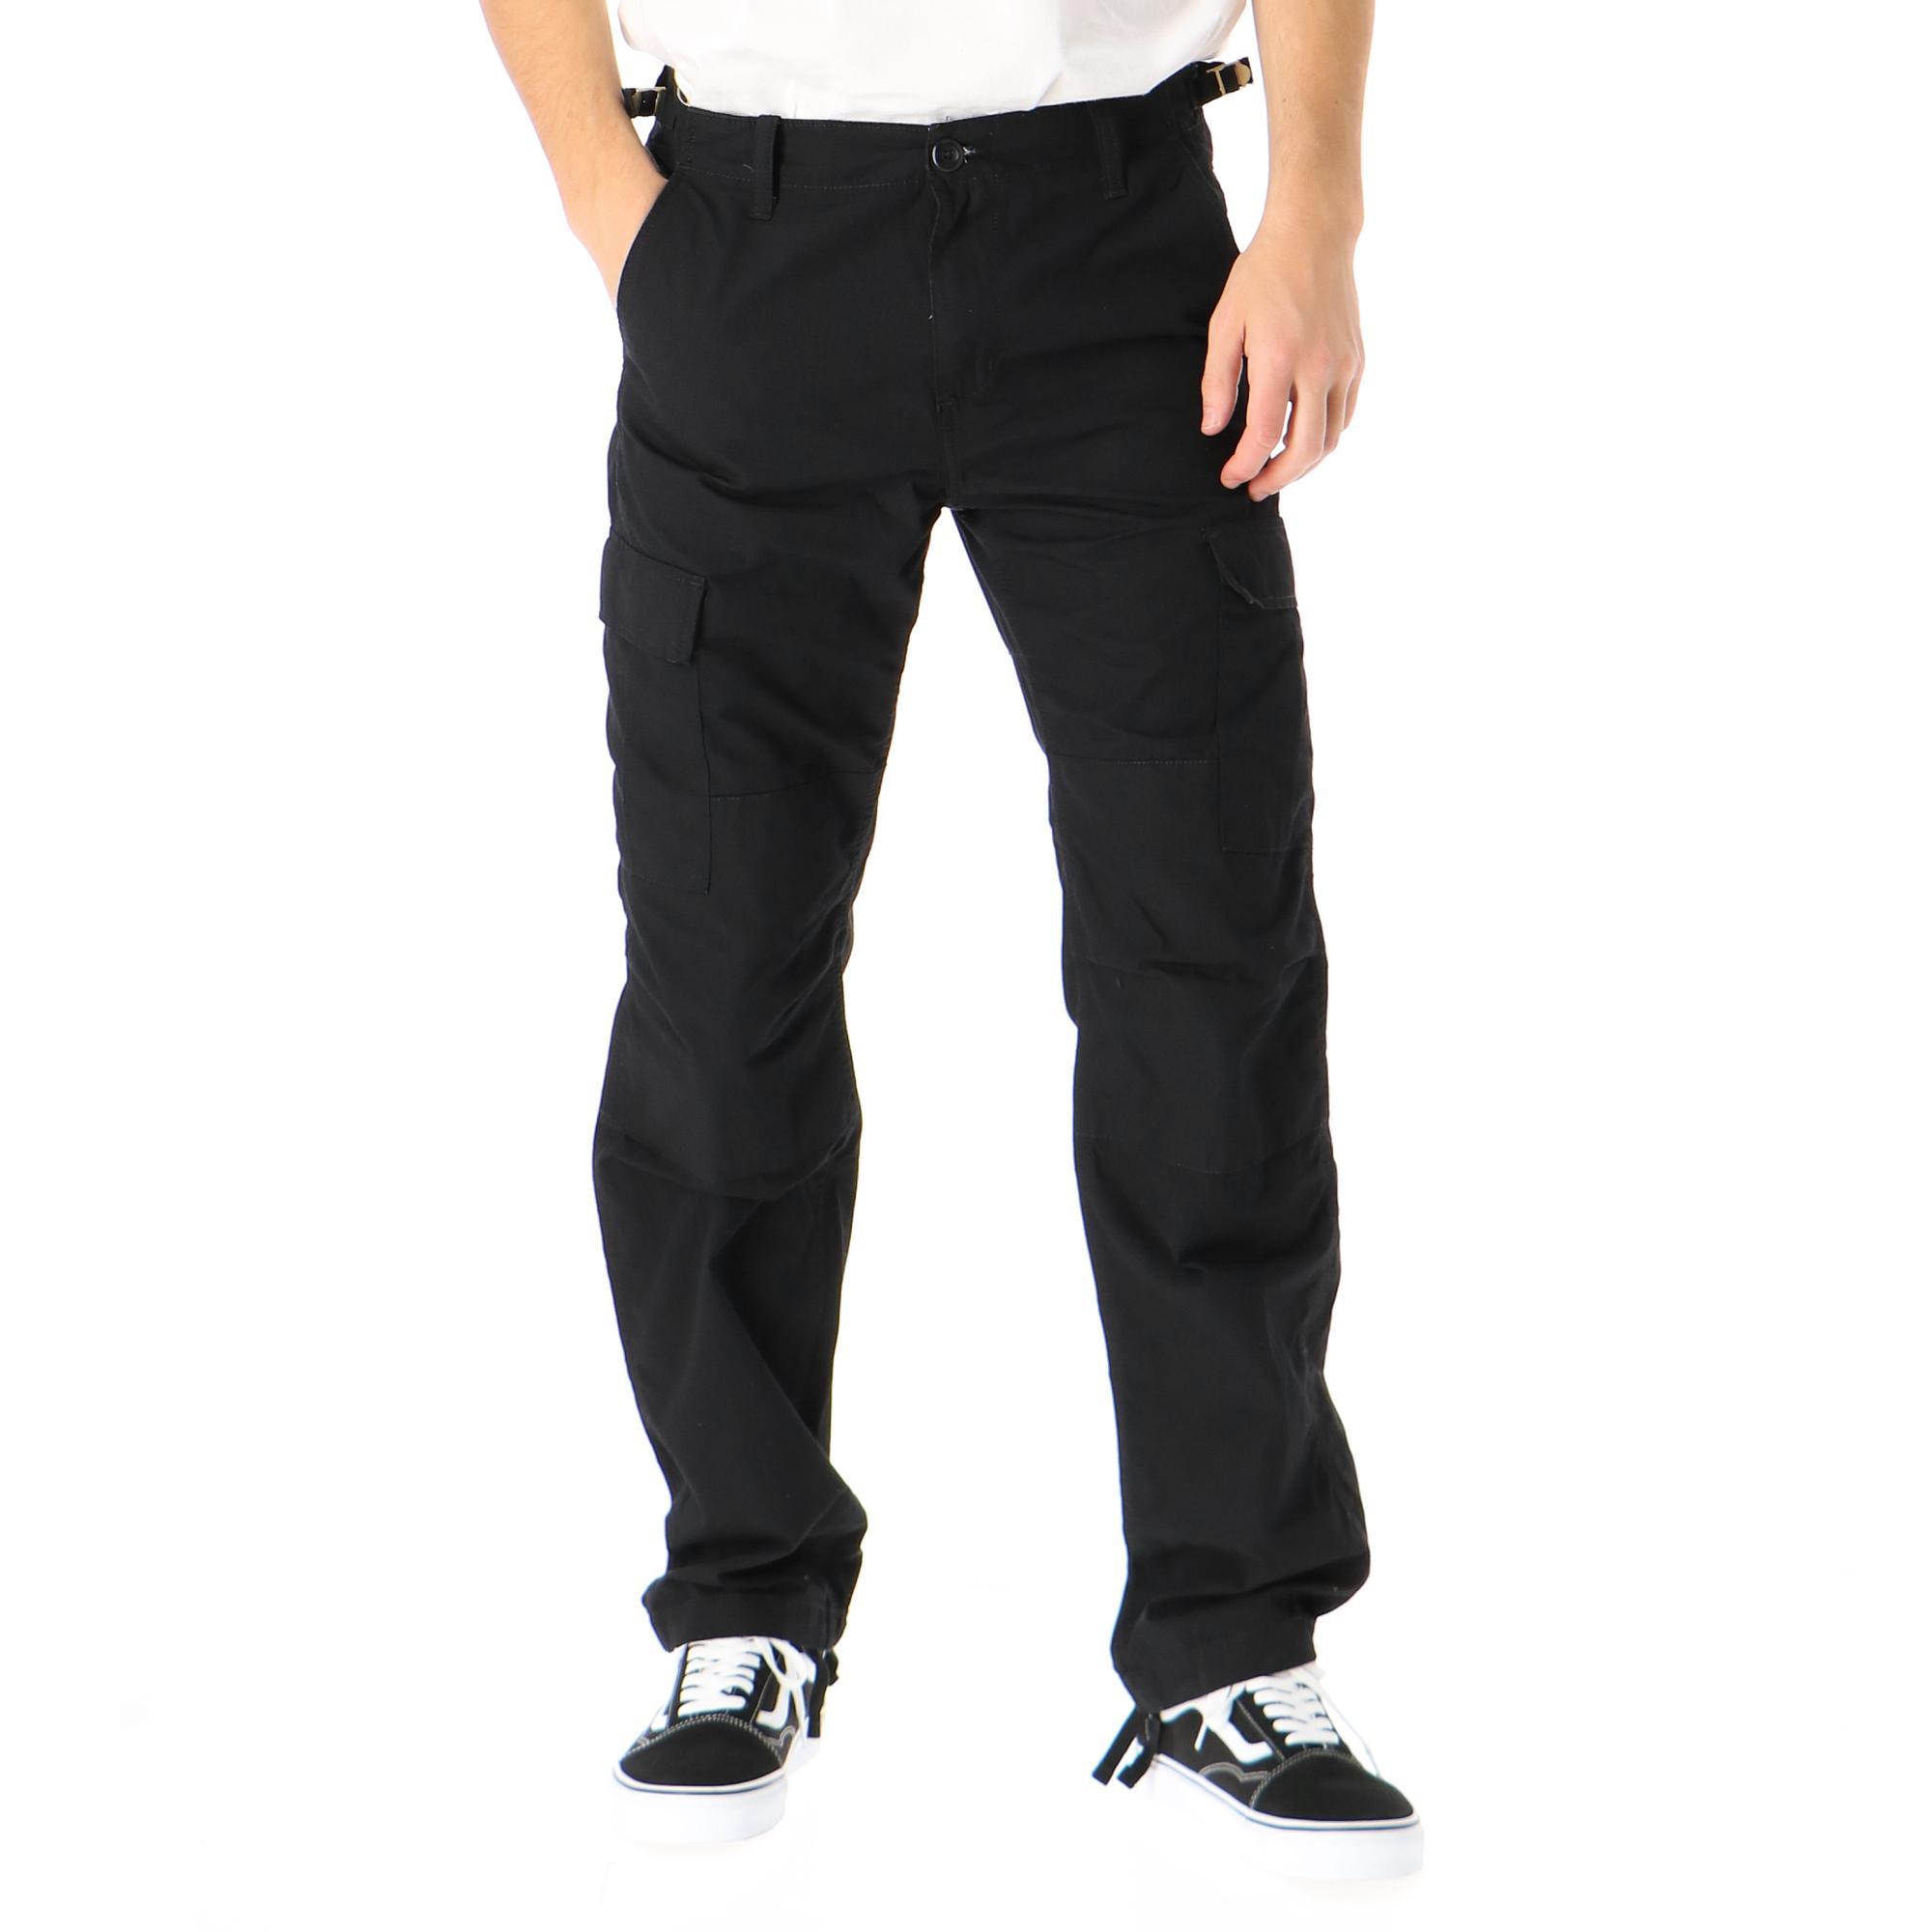 Carhartt Aviation Pant Black rinsed